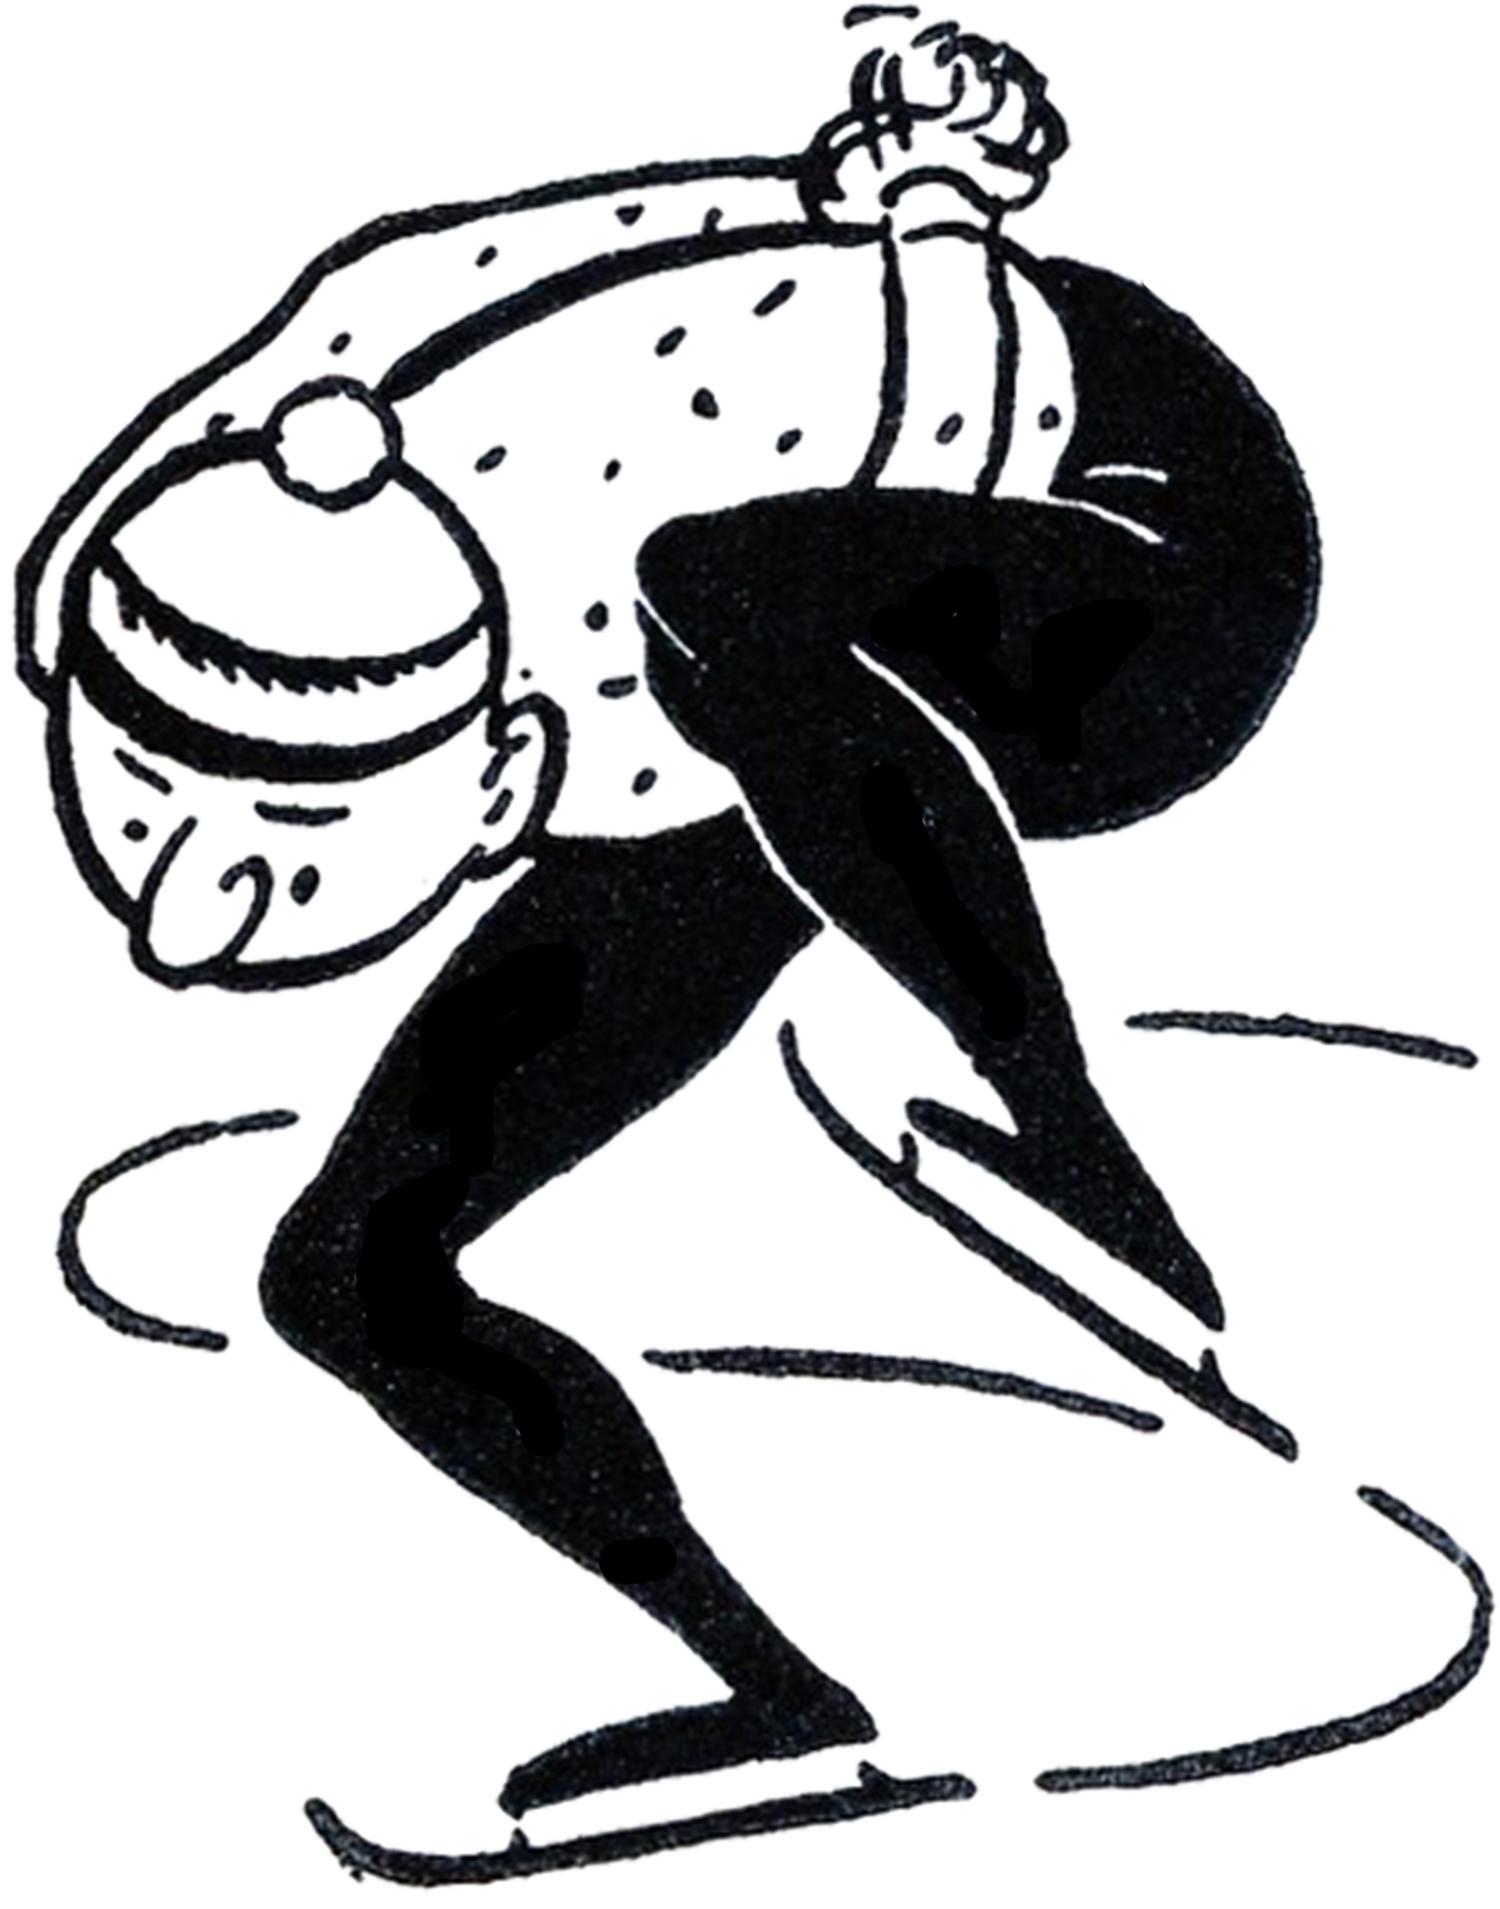 Vintage Ice Skating Images